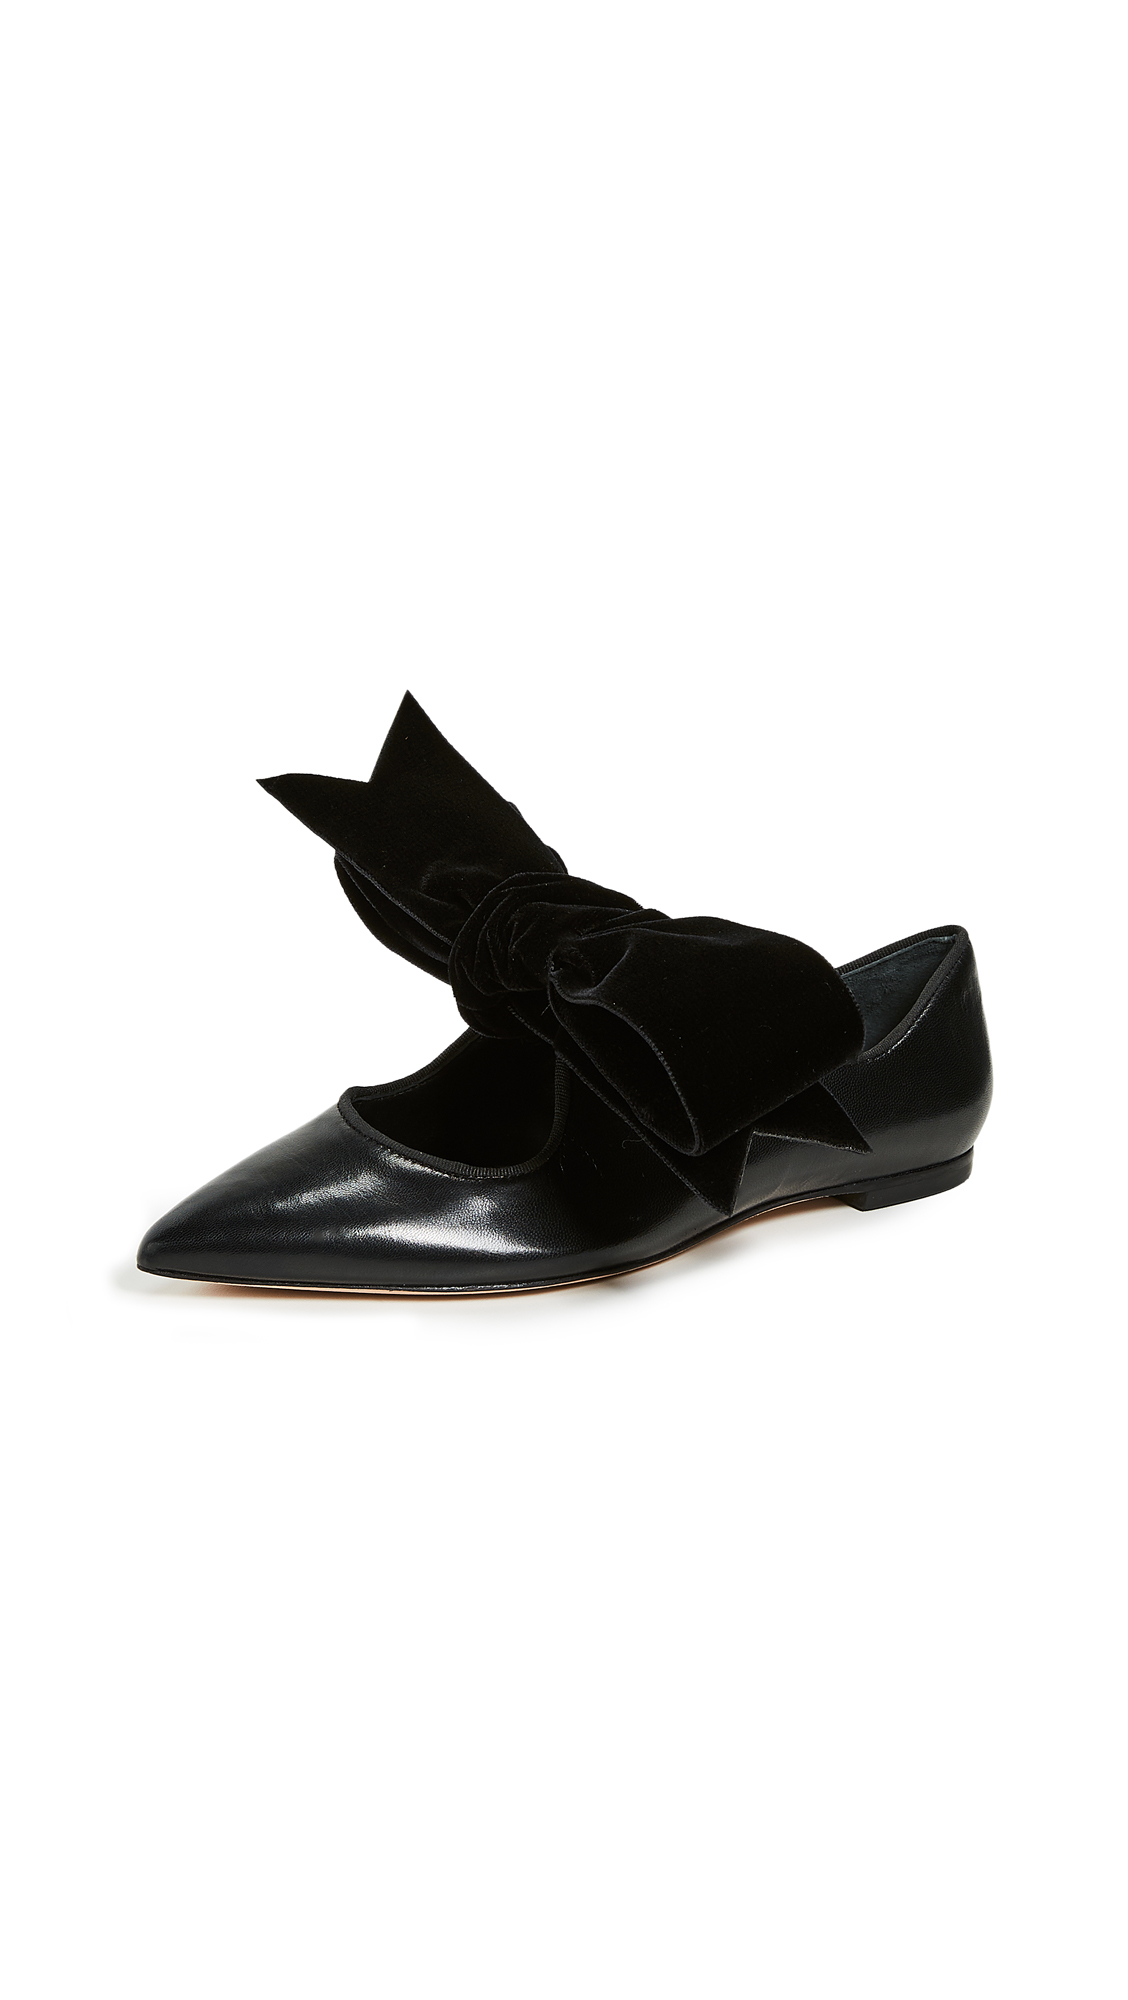 Tory Burch Clara Flats - Perfect Black